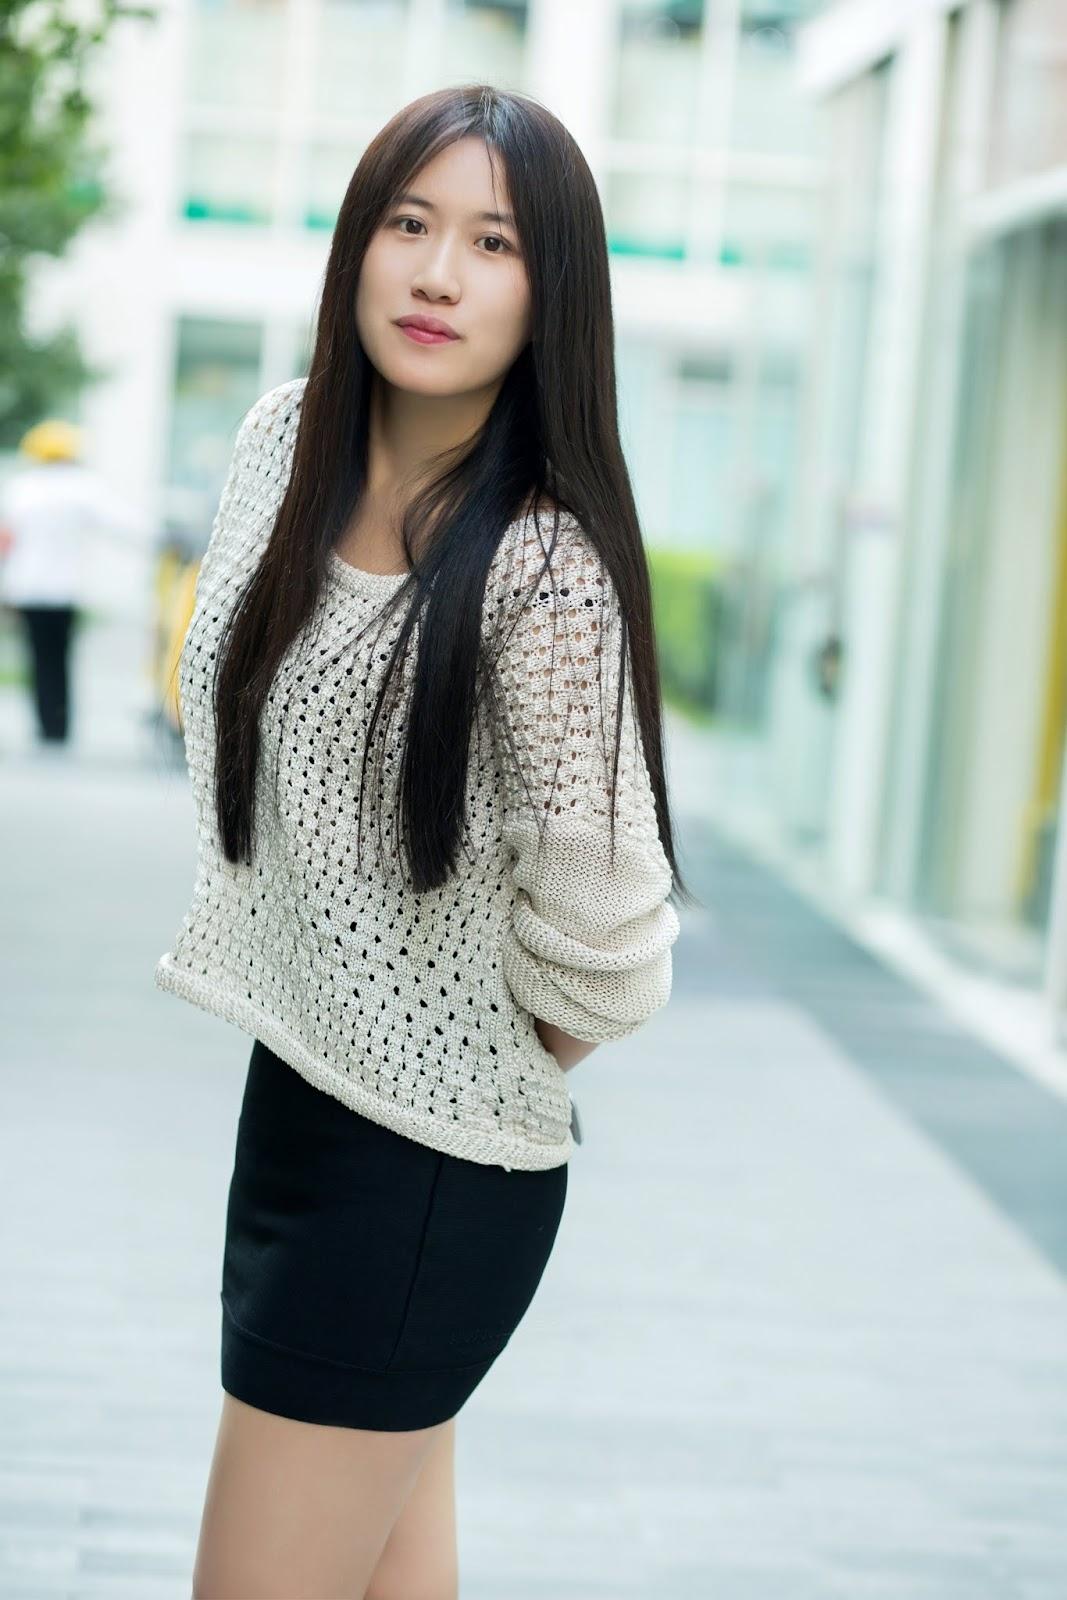 Jessica%2B%252811%2529 - TuiGirl No.60